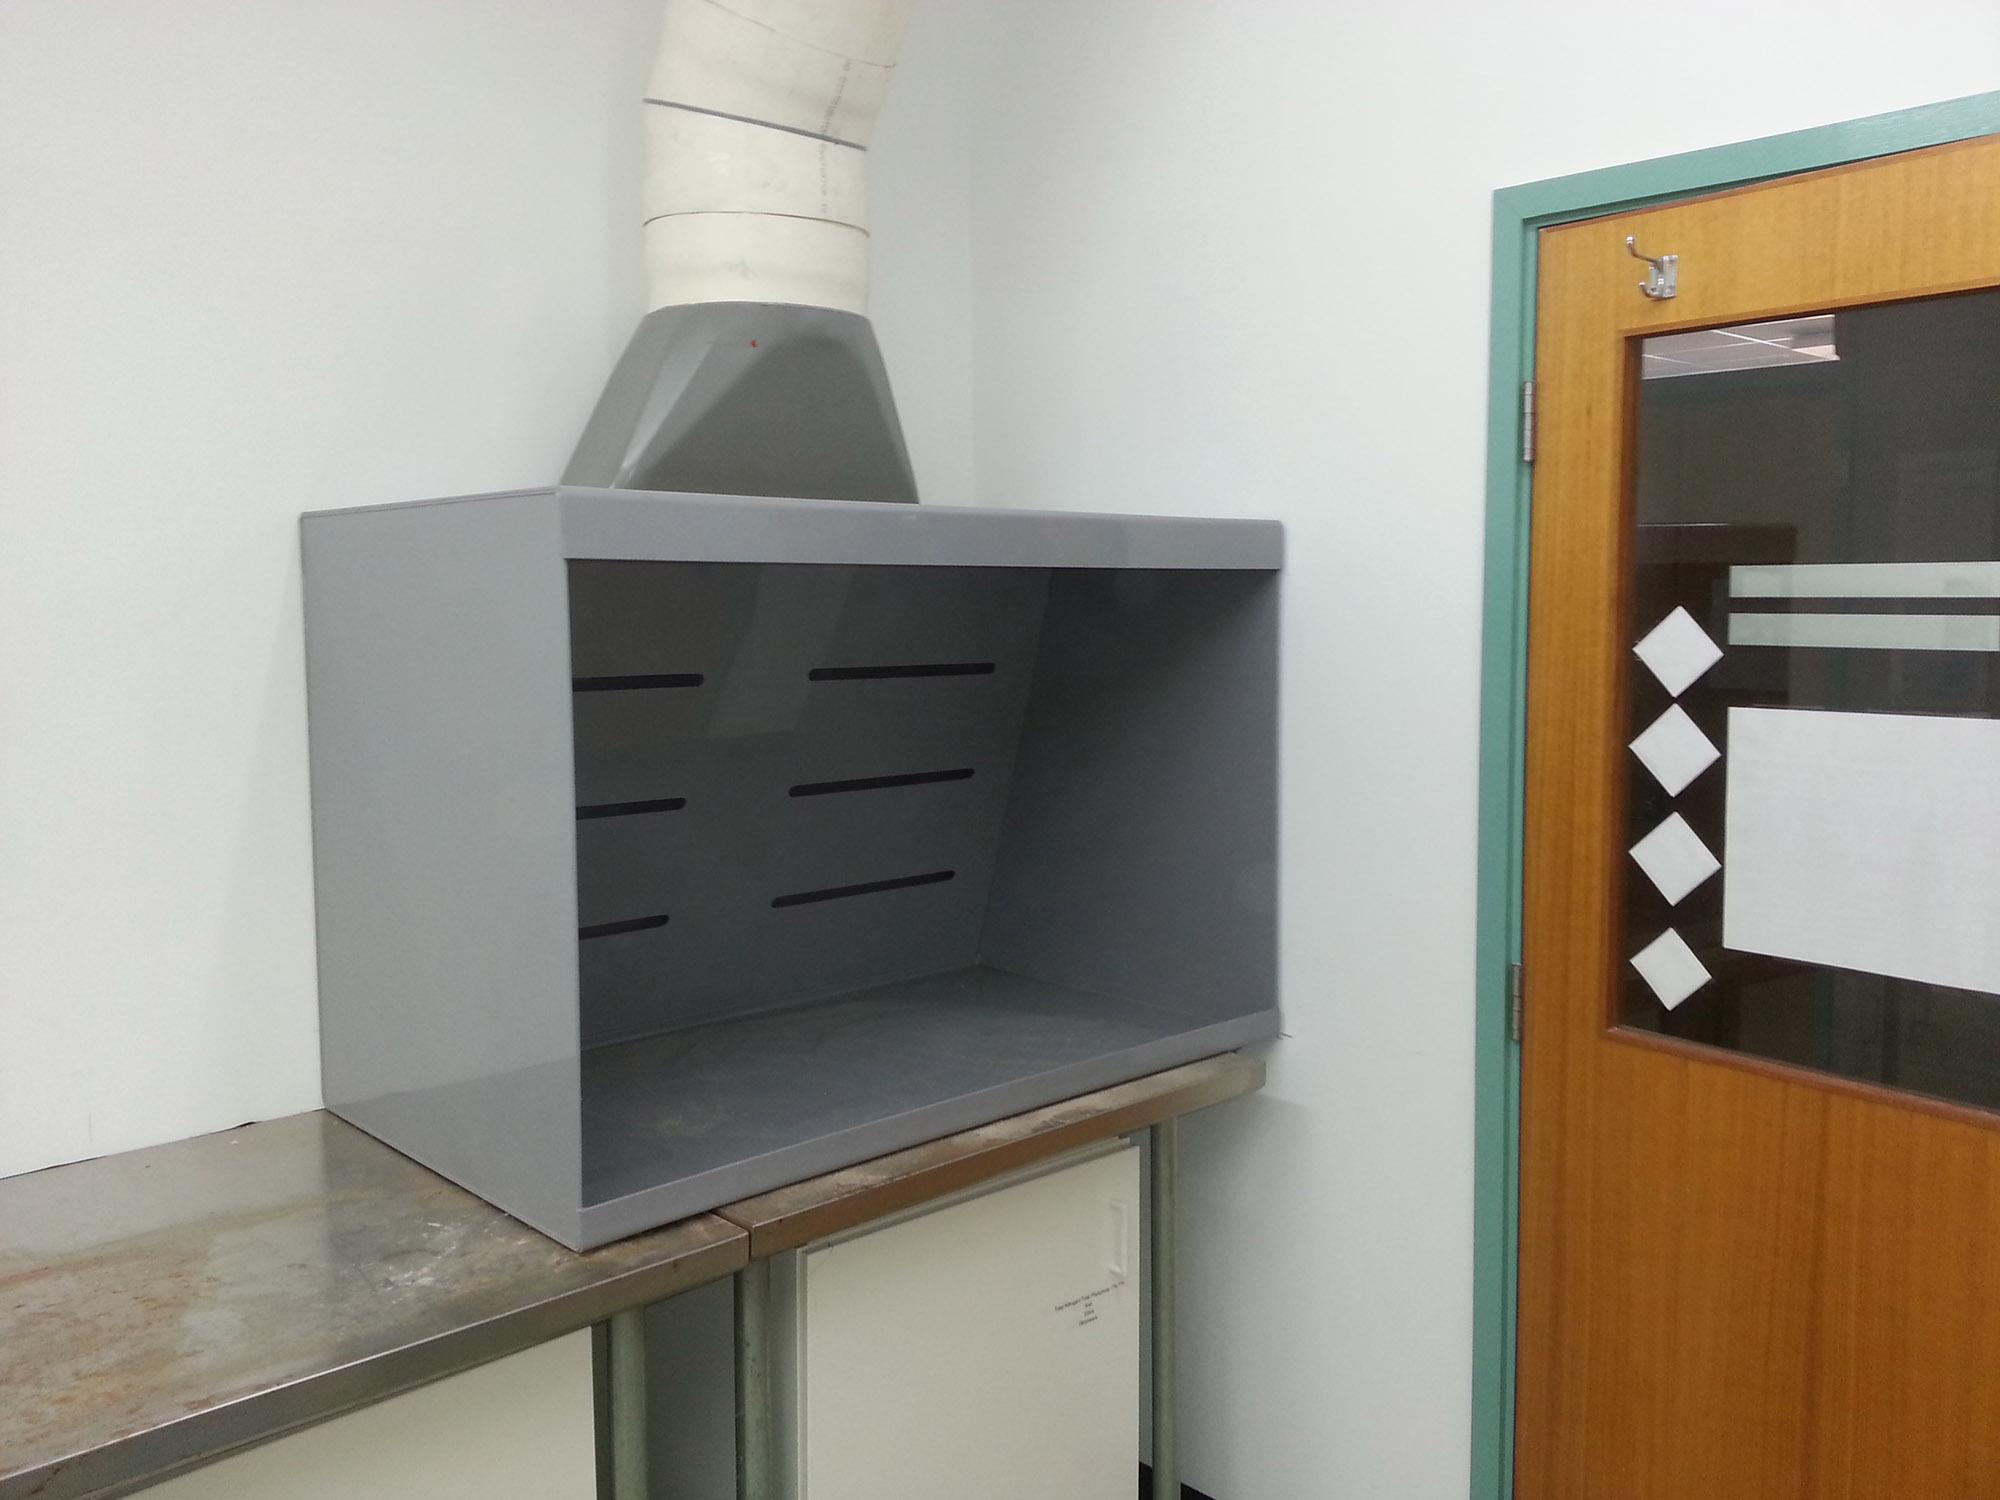 PVC side draft hood